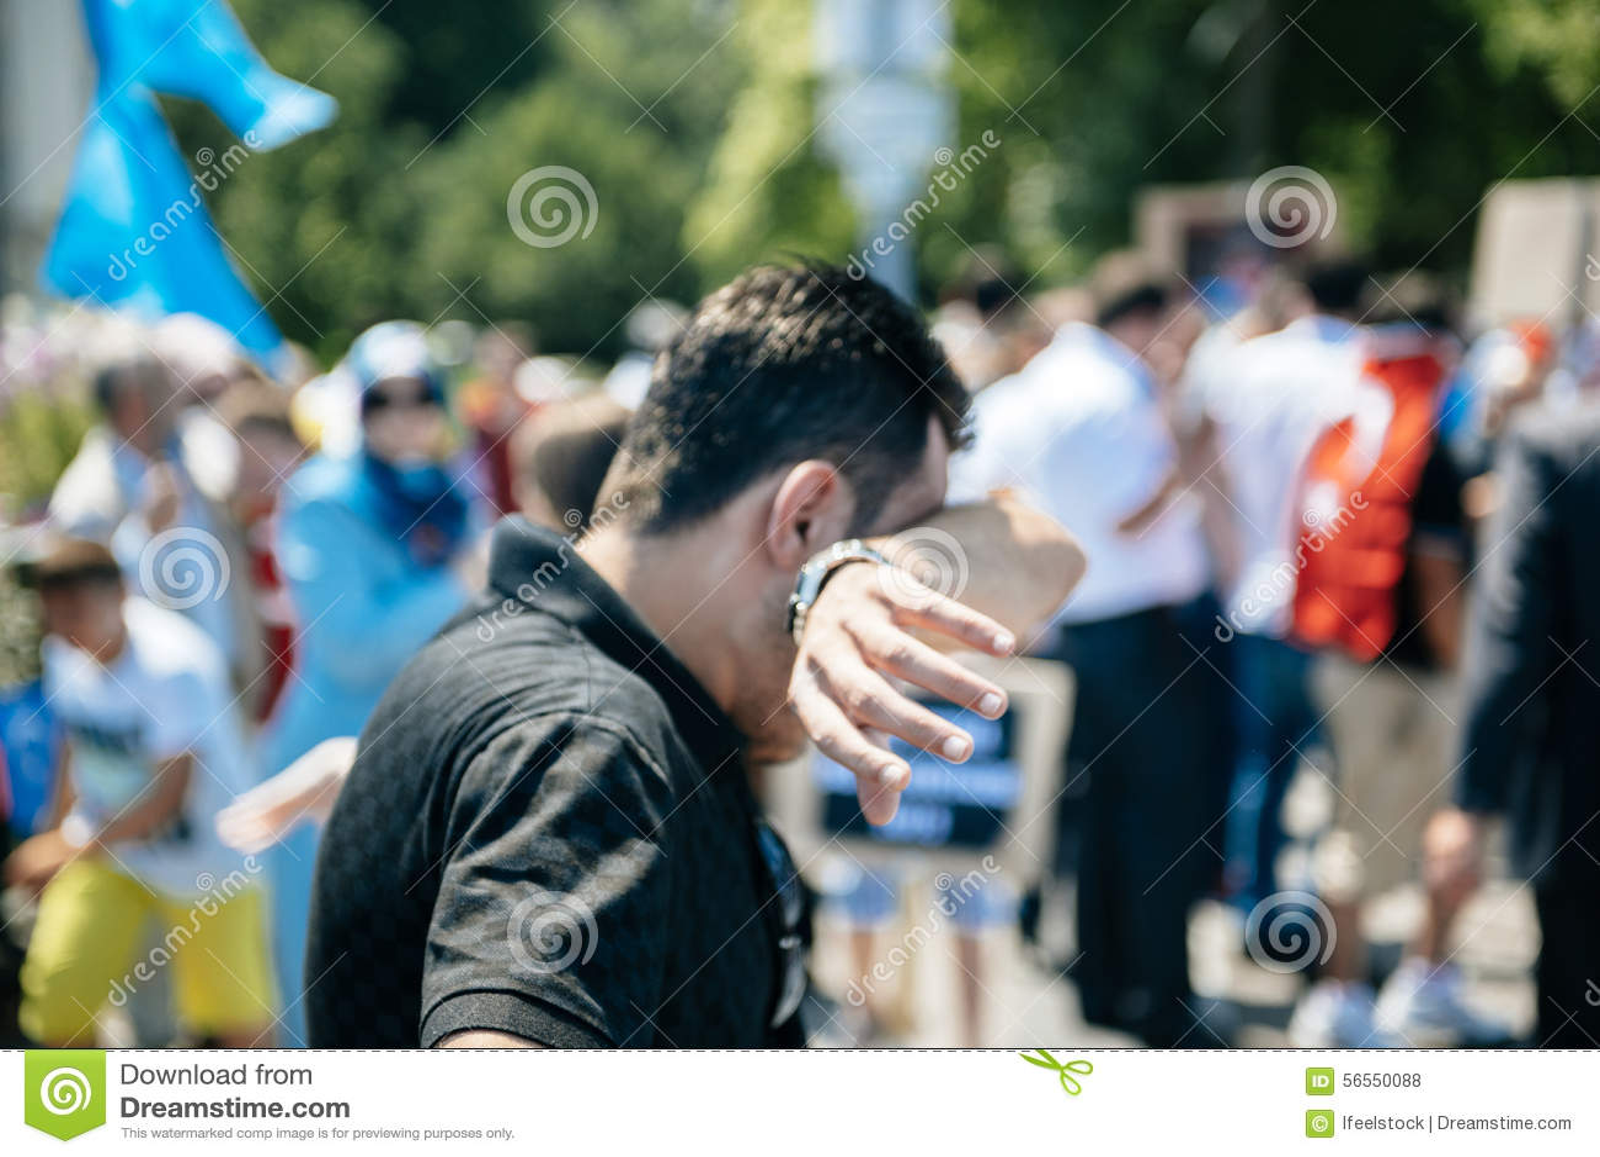 Download Διαμαρτυρία ενεργών στελεχών των ανθρώπινων δικαιωμάτων Uyghur Εκδοτική Στοκ Εικόνες - εικόνα από γλώσσα, δύναμη: 56550088